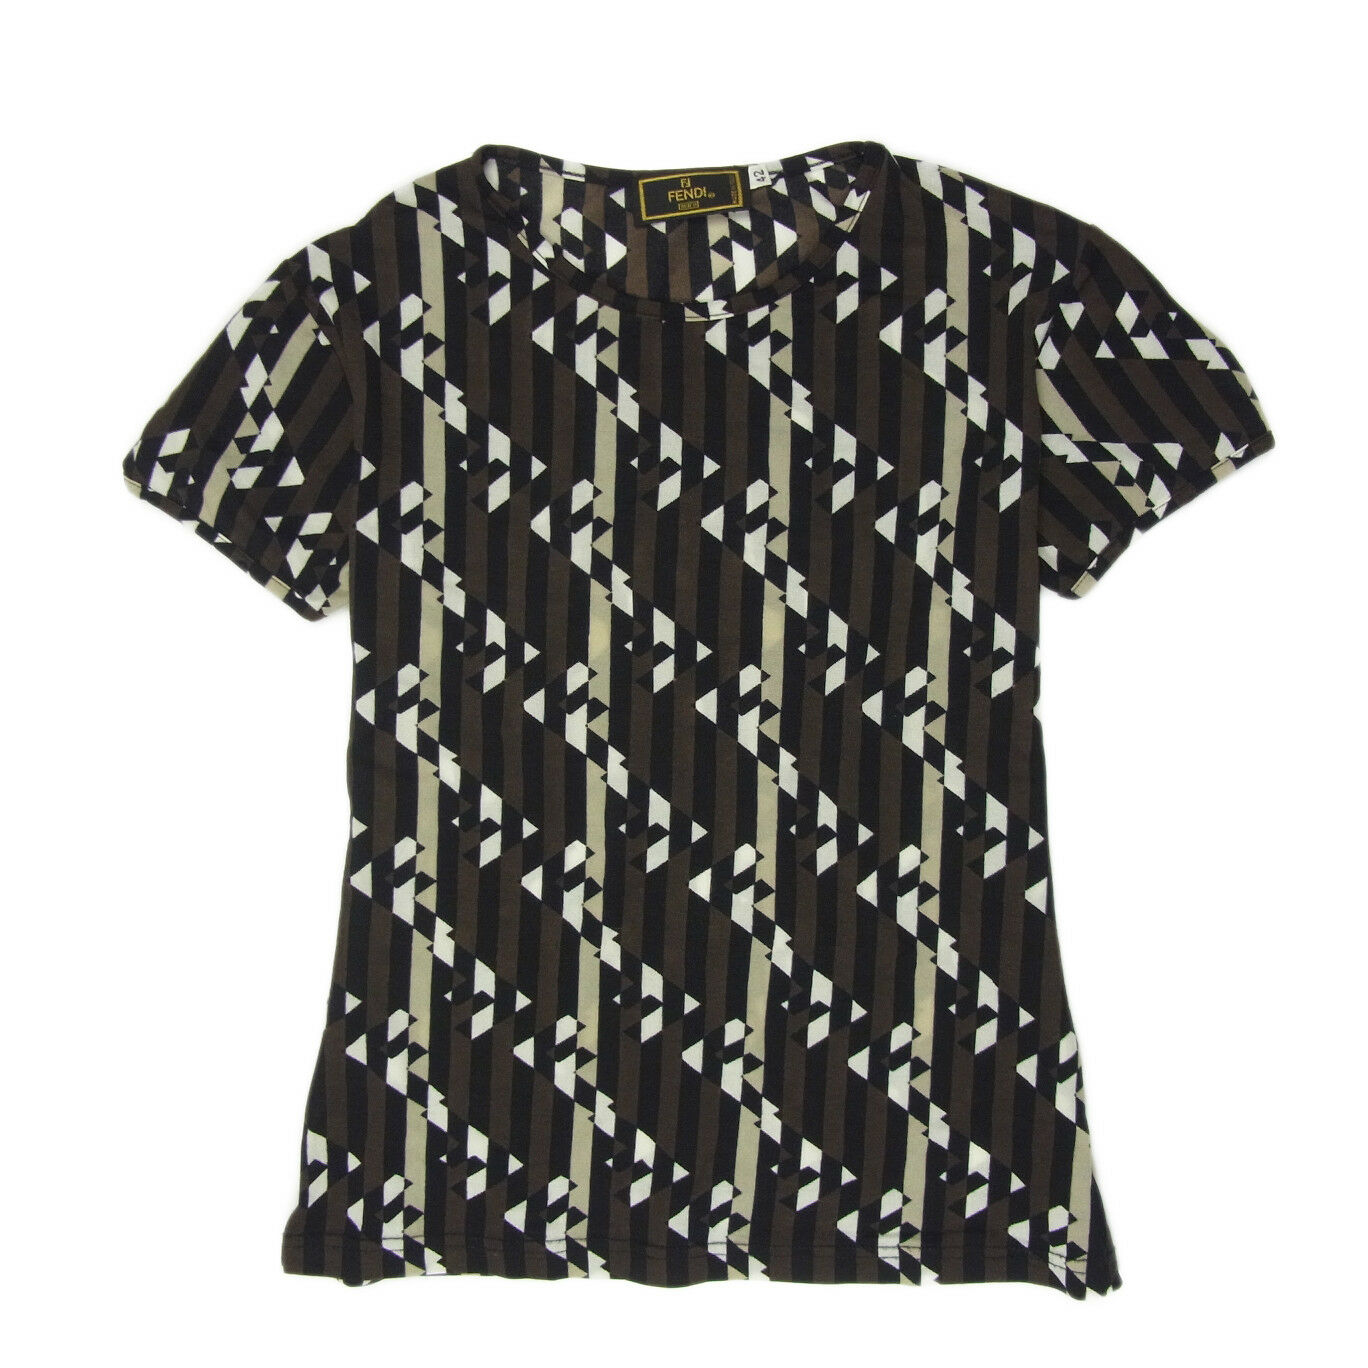 Auth FENDI Vintage Logos Stripe Pattern T Shirt Tops Sz 42 US M F S 1733